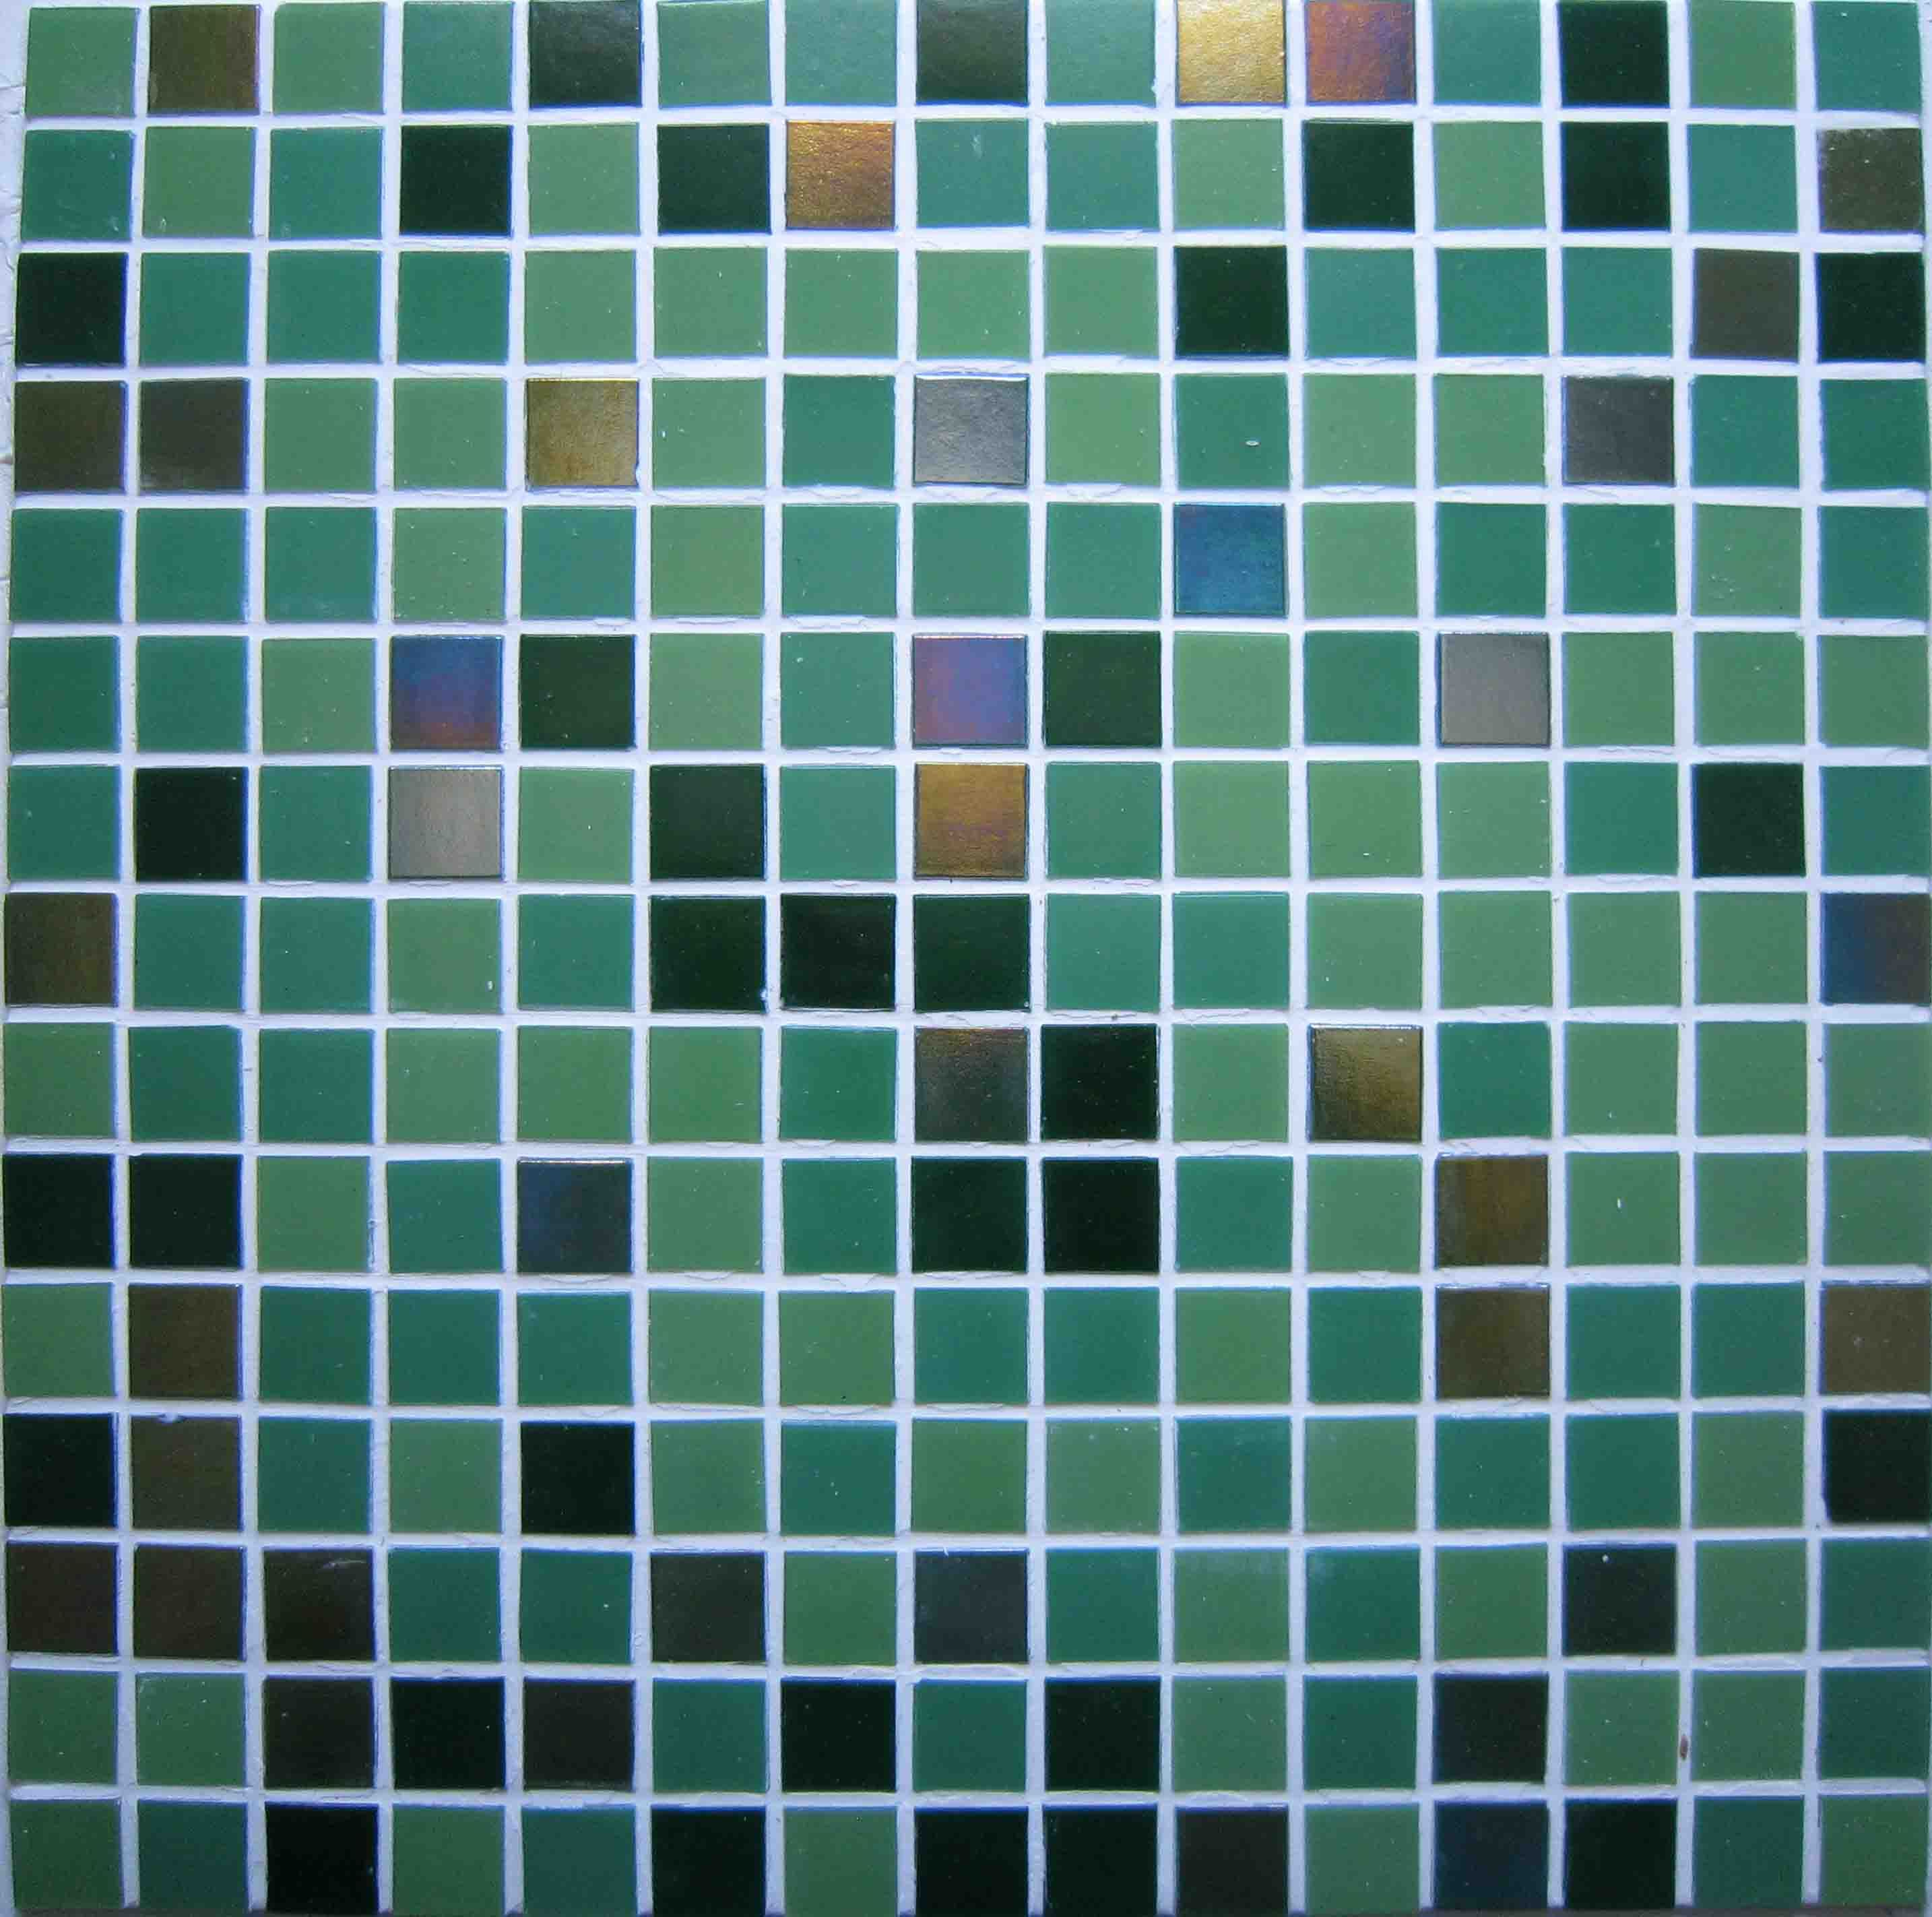 Carrelage Salle De Bain Vert Emeraude ~ carrelage vert salle de bain sur pinterest carrelage mural cuisine